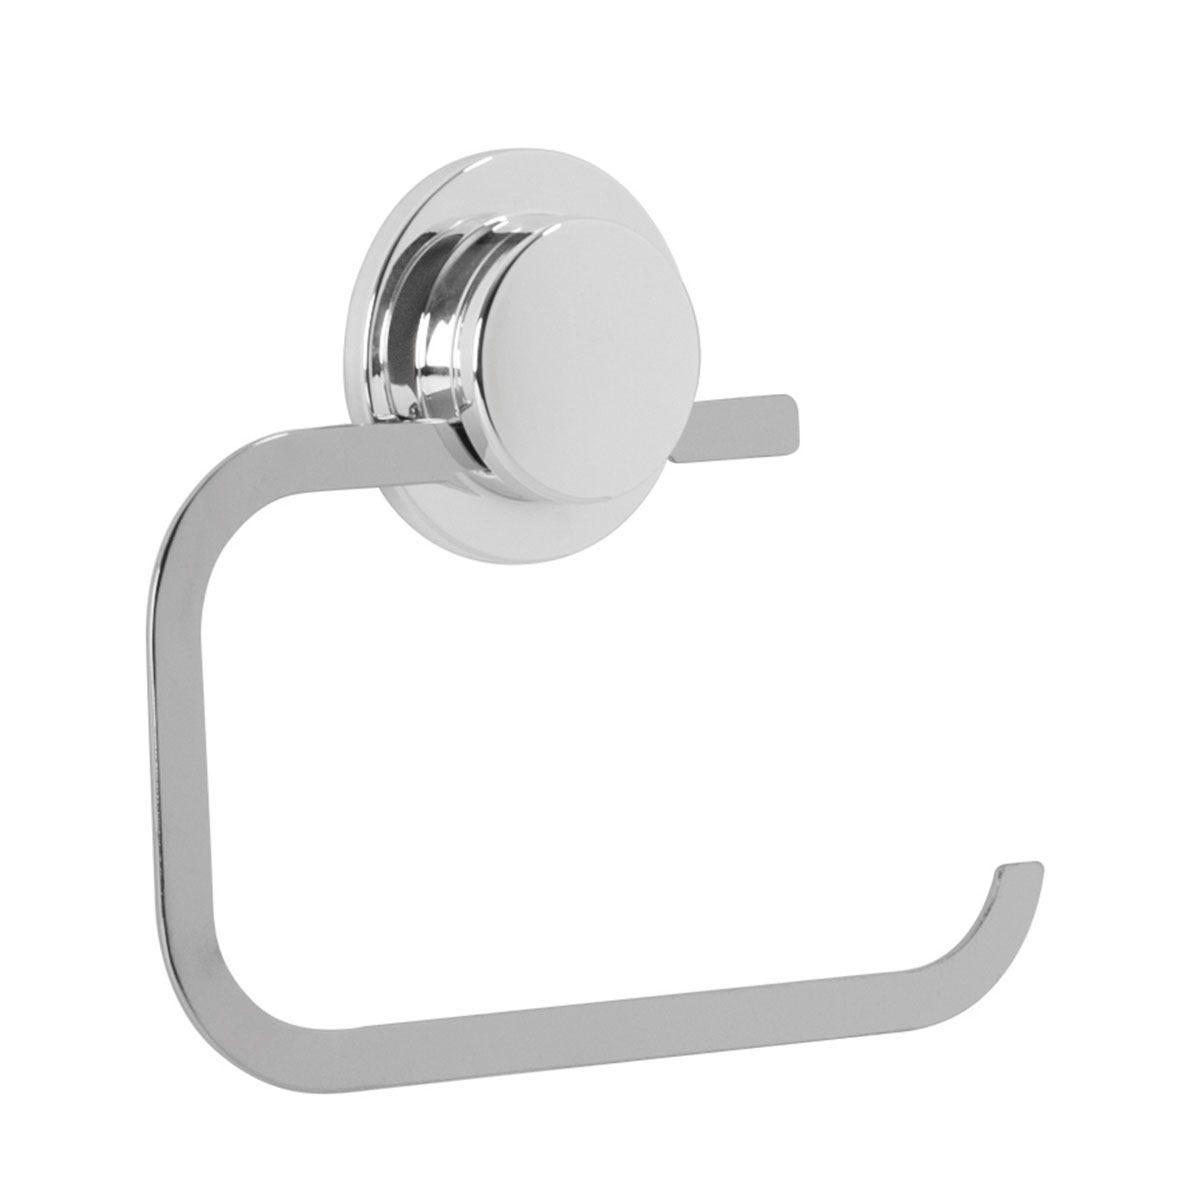 Croydex Stick n Lock 2 Toilet Roll Holder